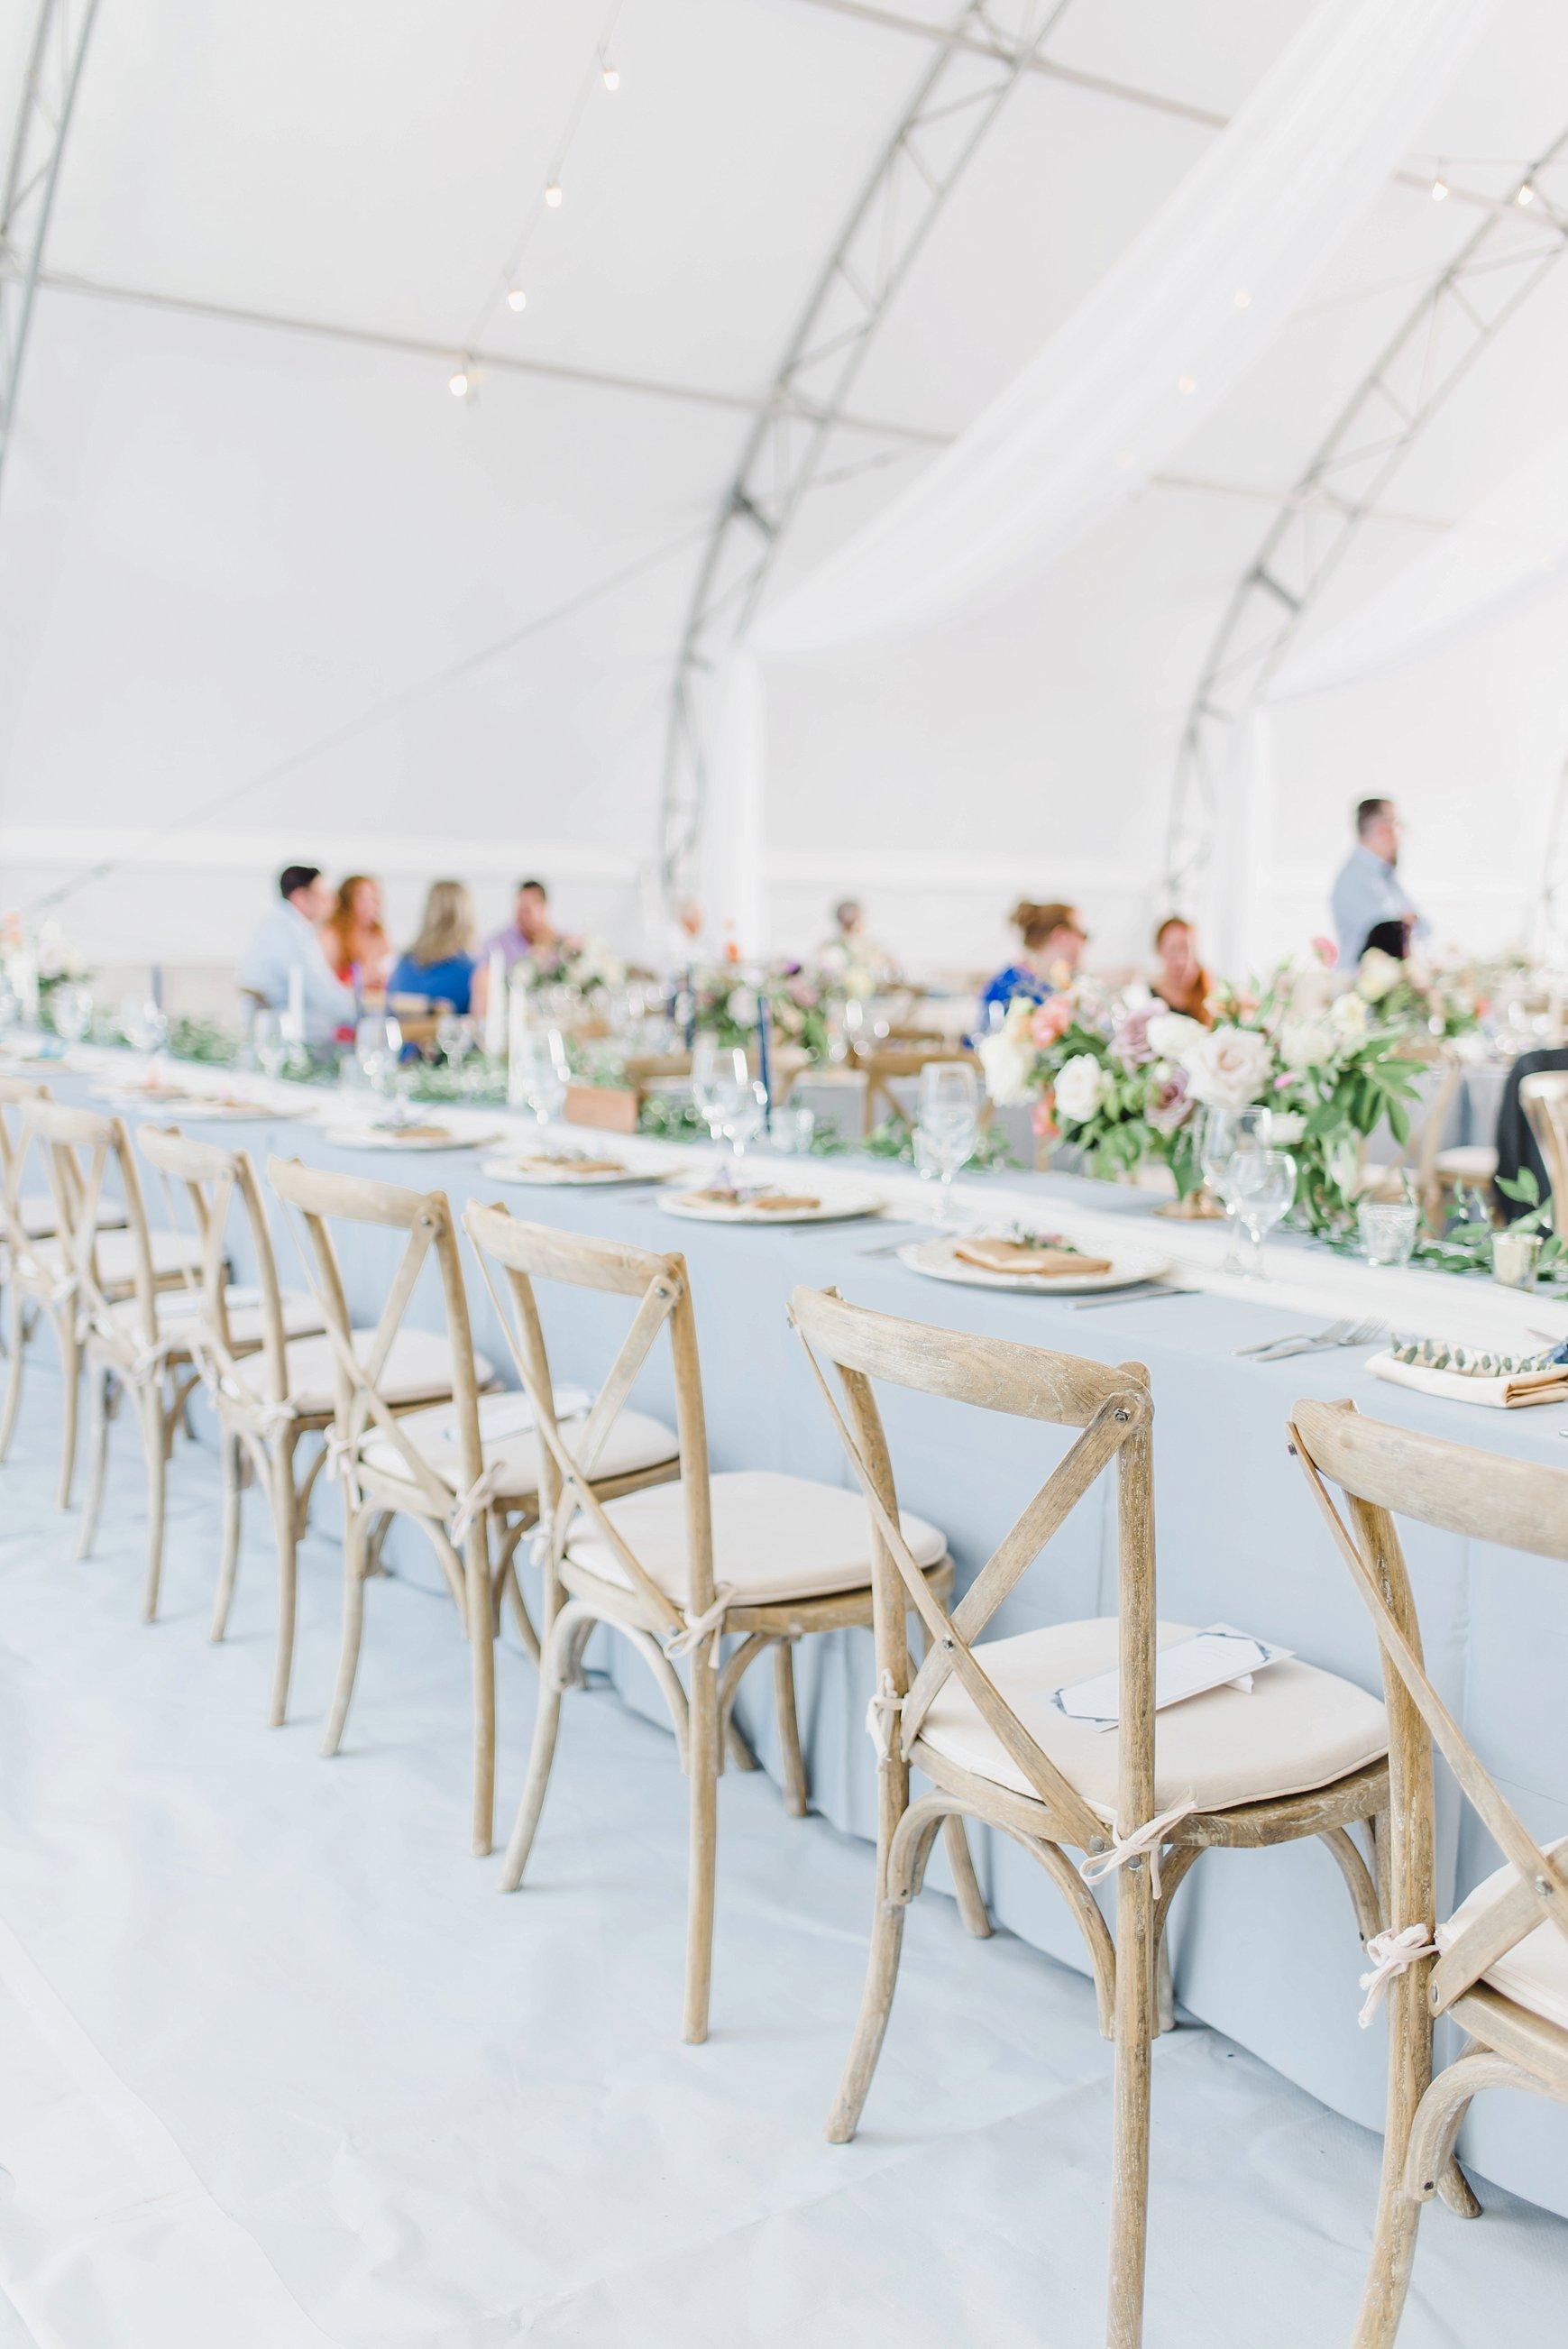 light airy indie fine art ottawa wedding photographer | Ali and Batoul Photography_0386.jpg